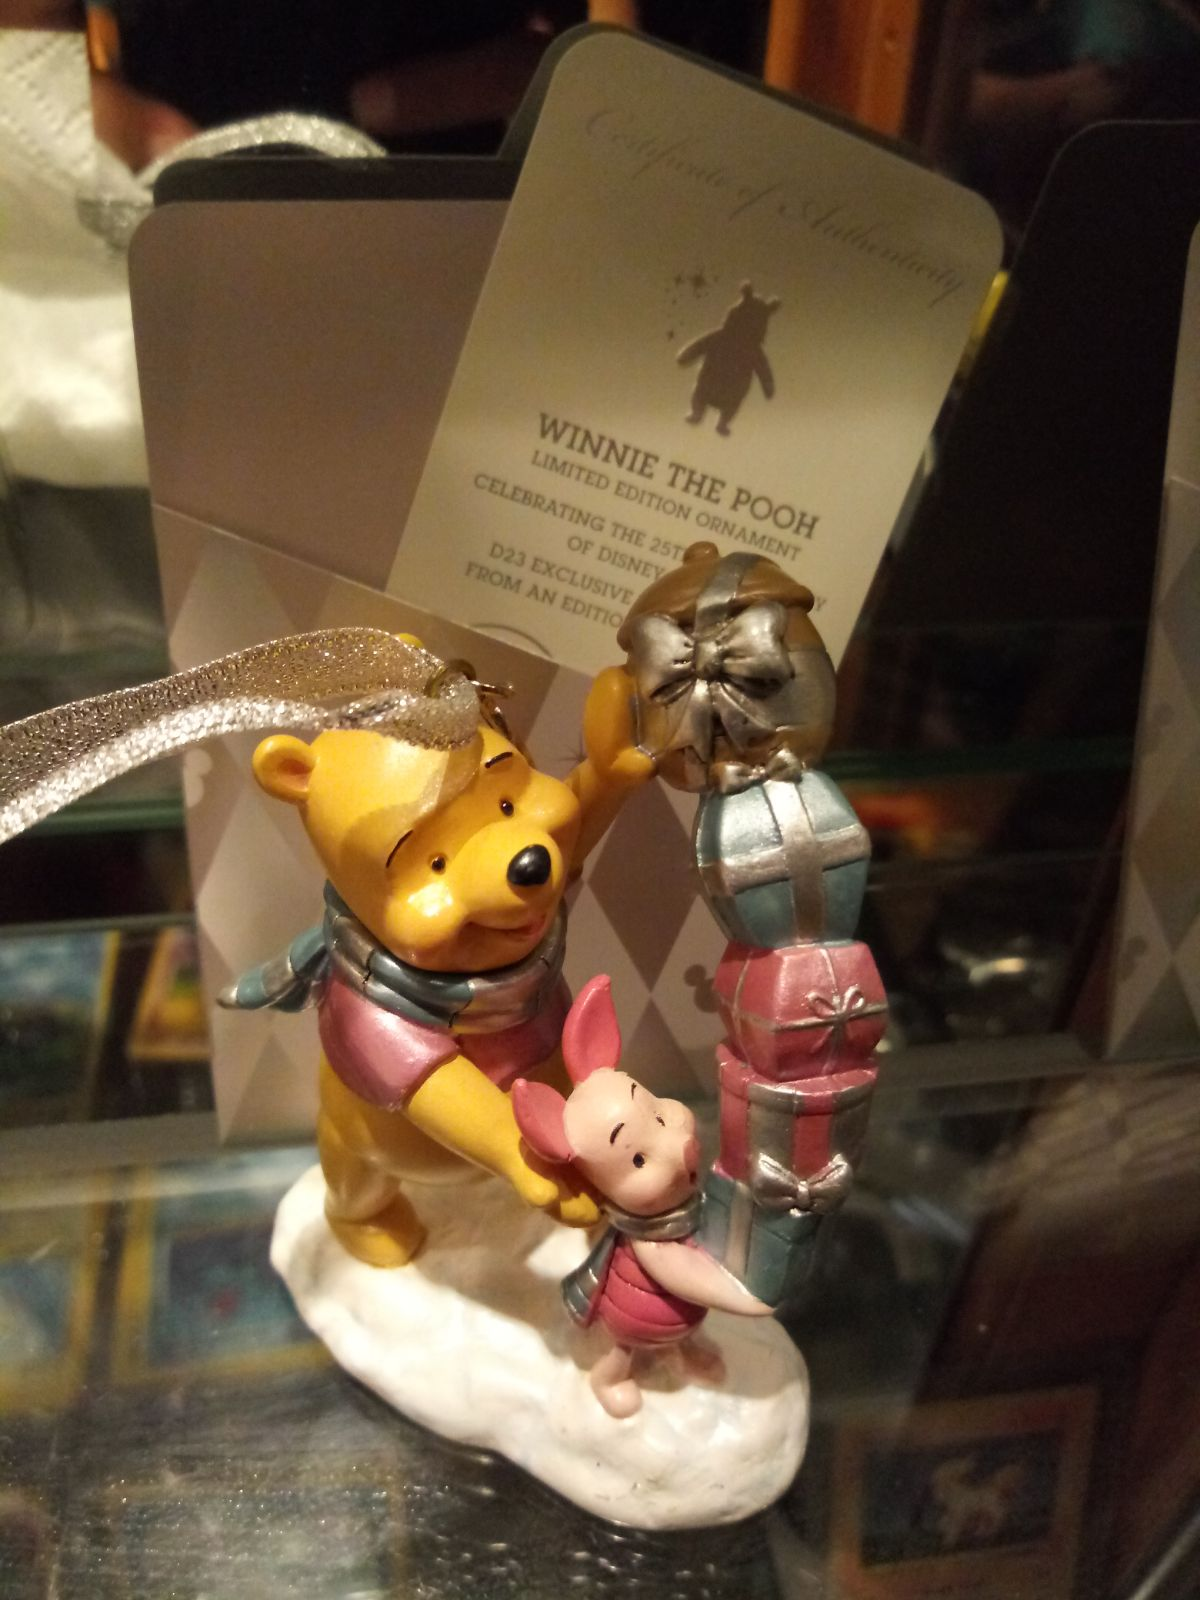 Diney winnie the pooh ornament